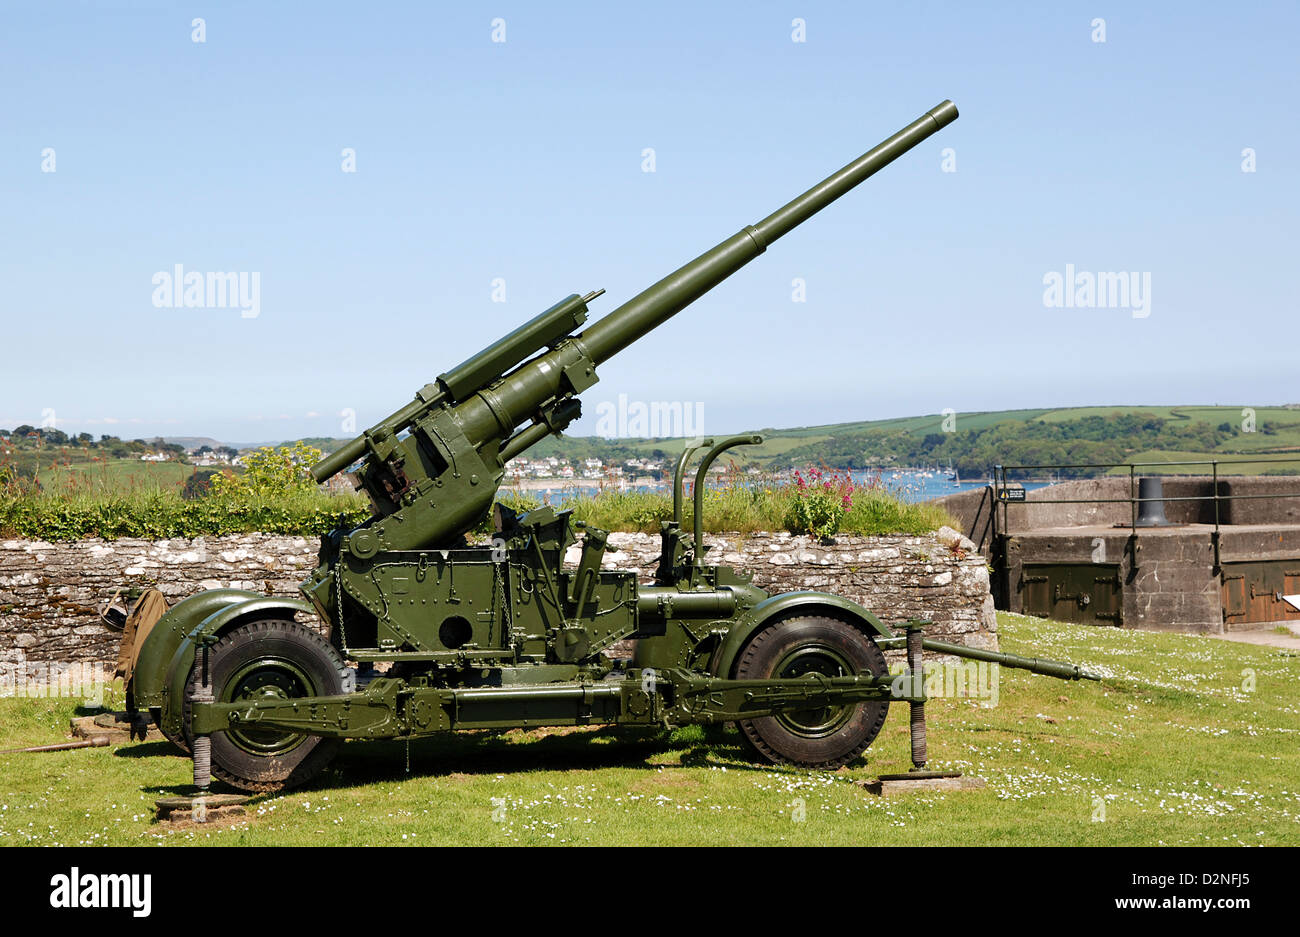 A world war two anti aircraft gun - Stock Image